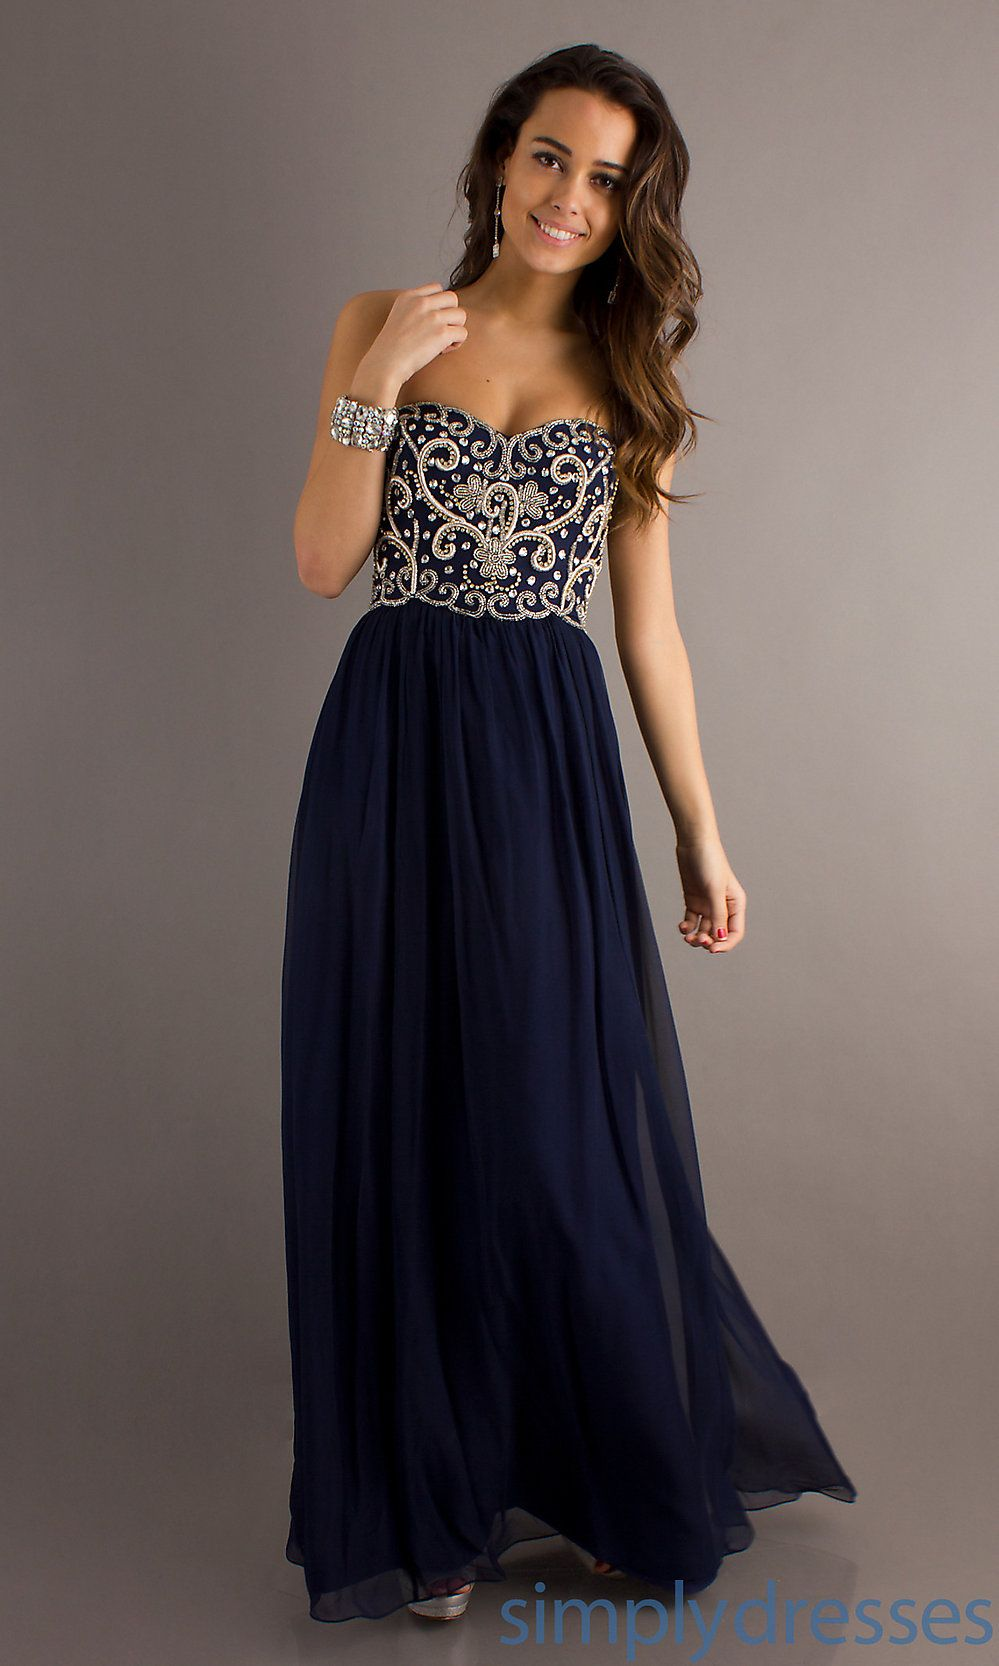 Bridesmaid dress navy lydia lydia lydia this with a grey jacket